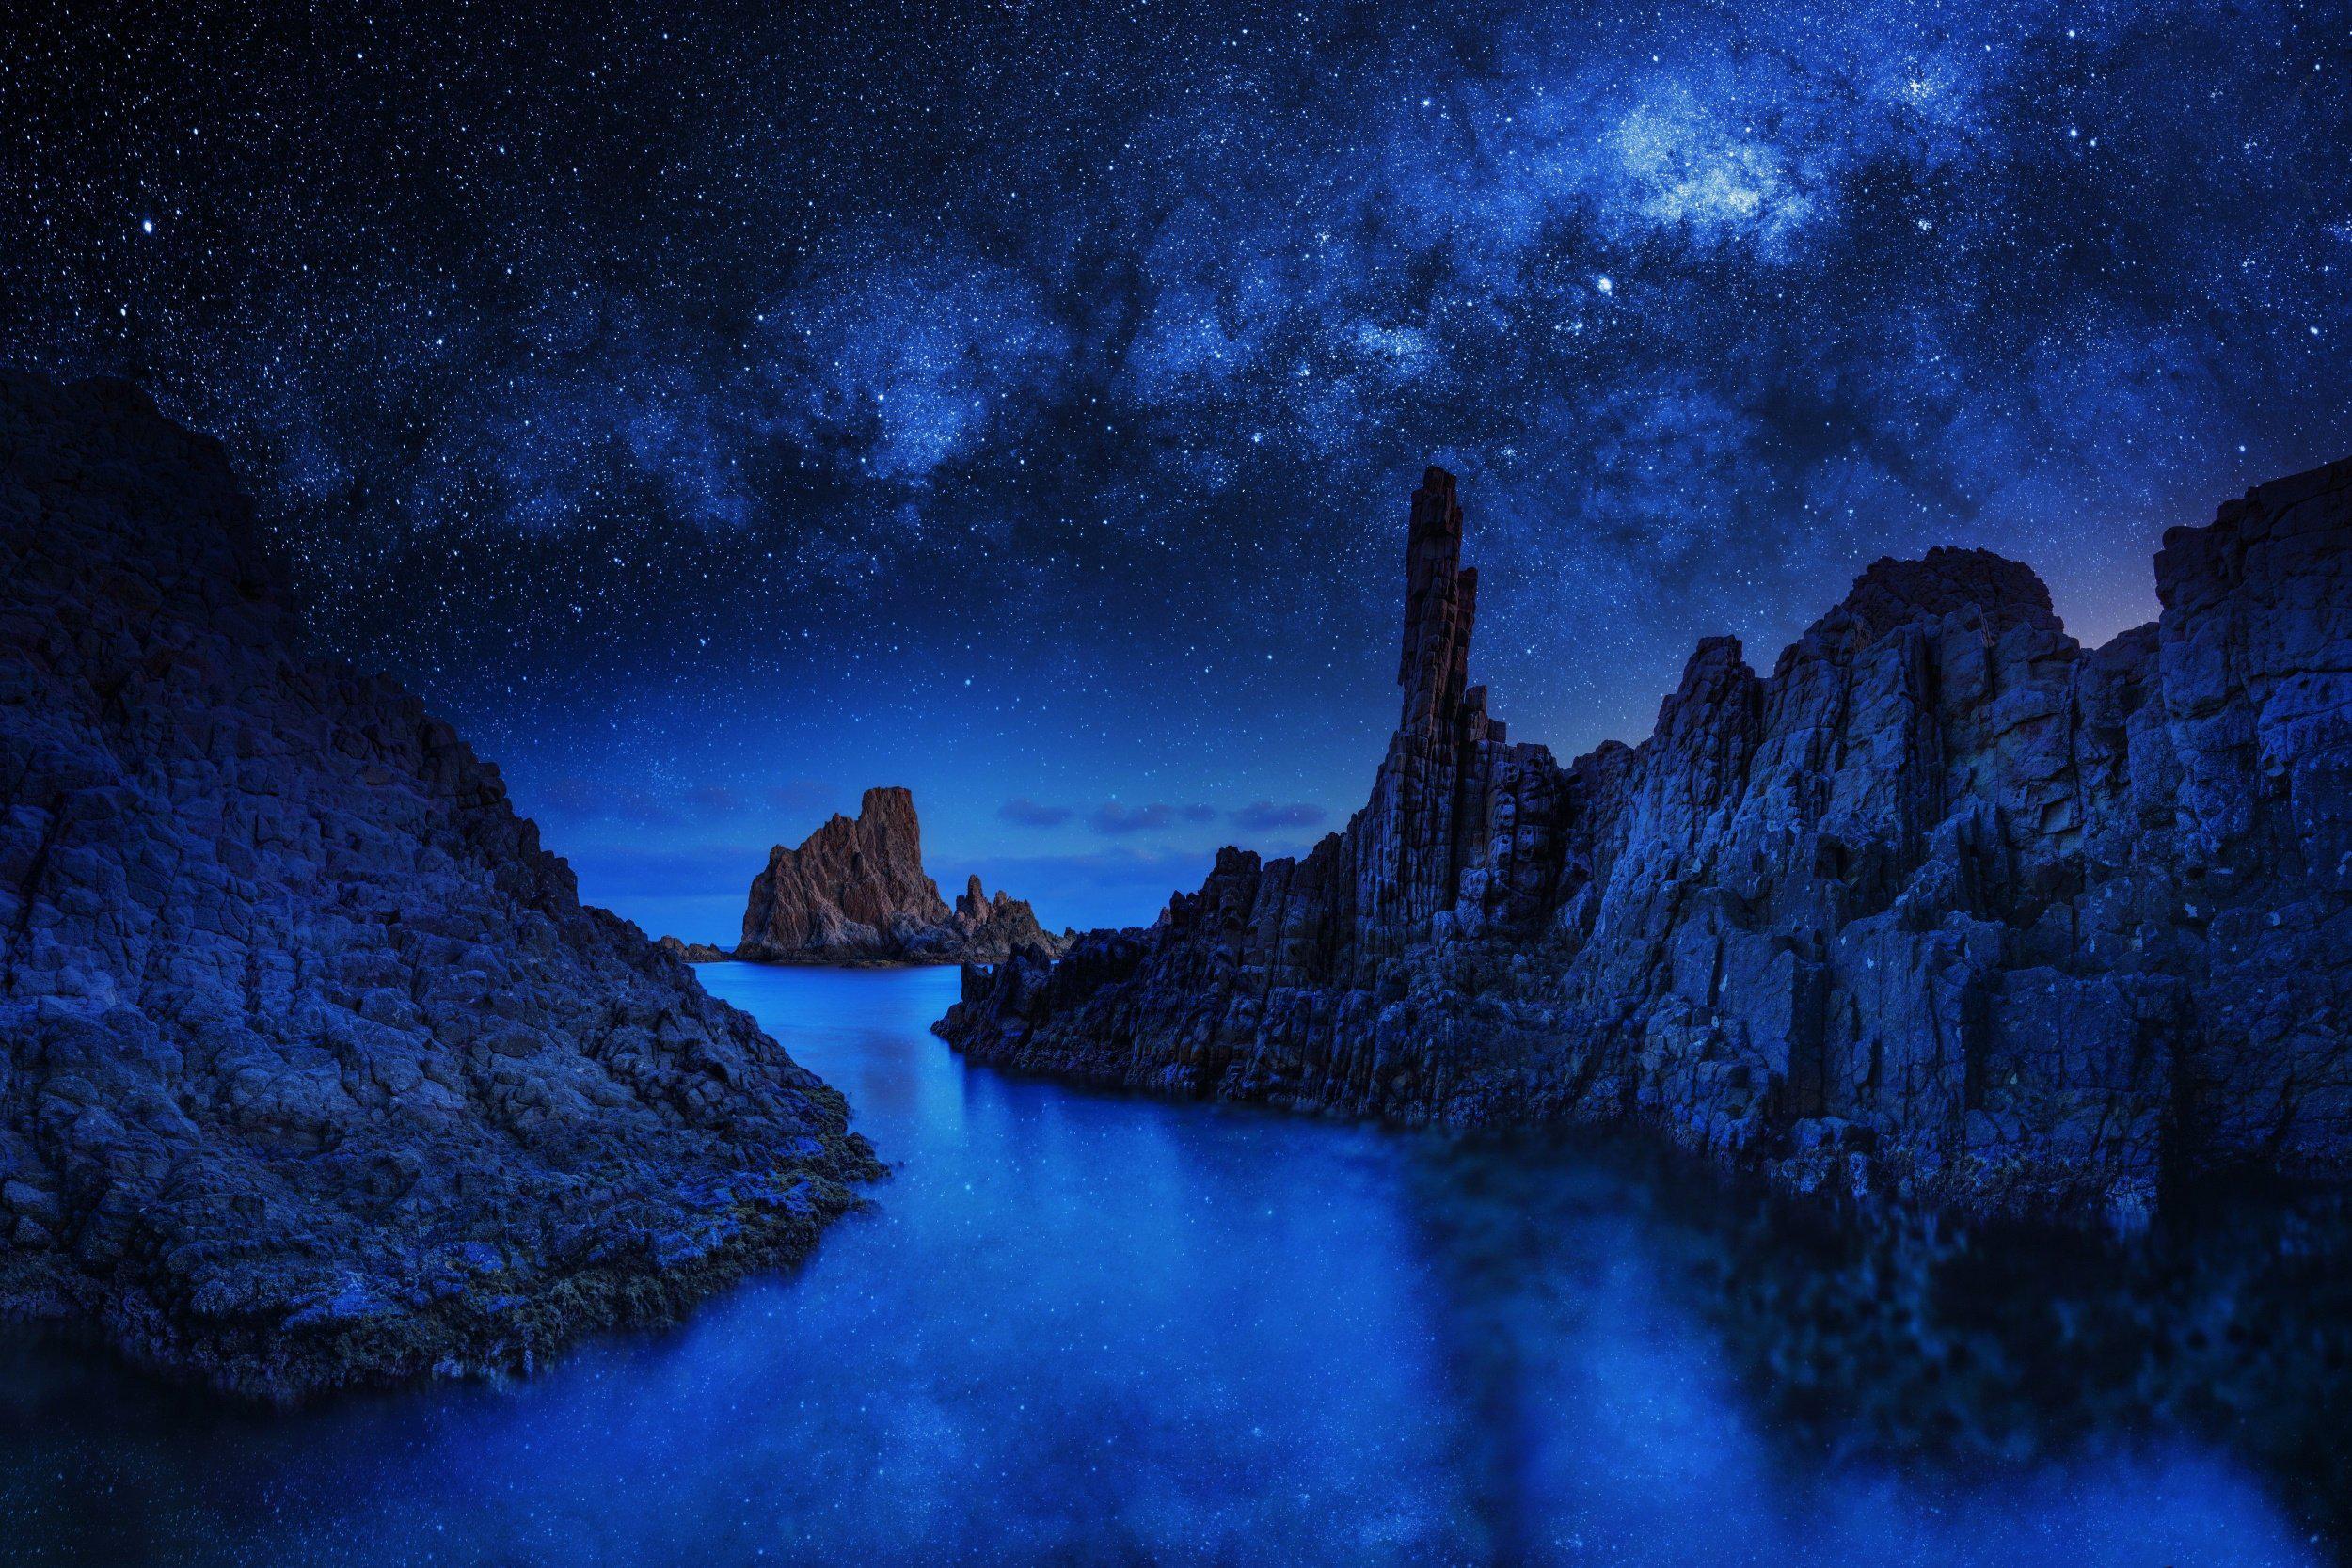 Ocean Rocks On Starry Night Hd Wallpaper Background Image